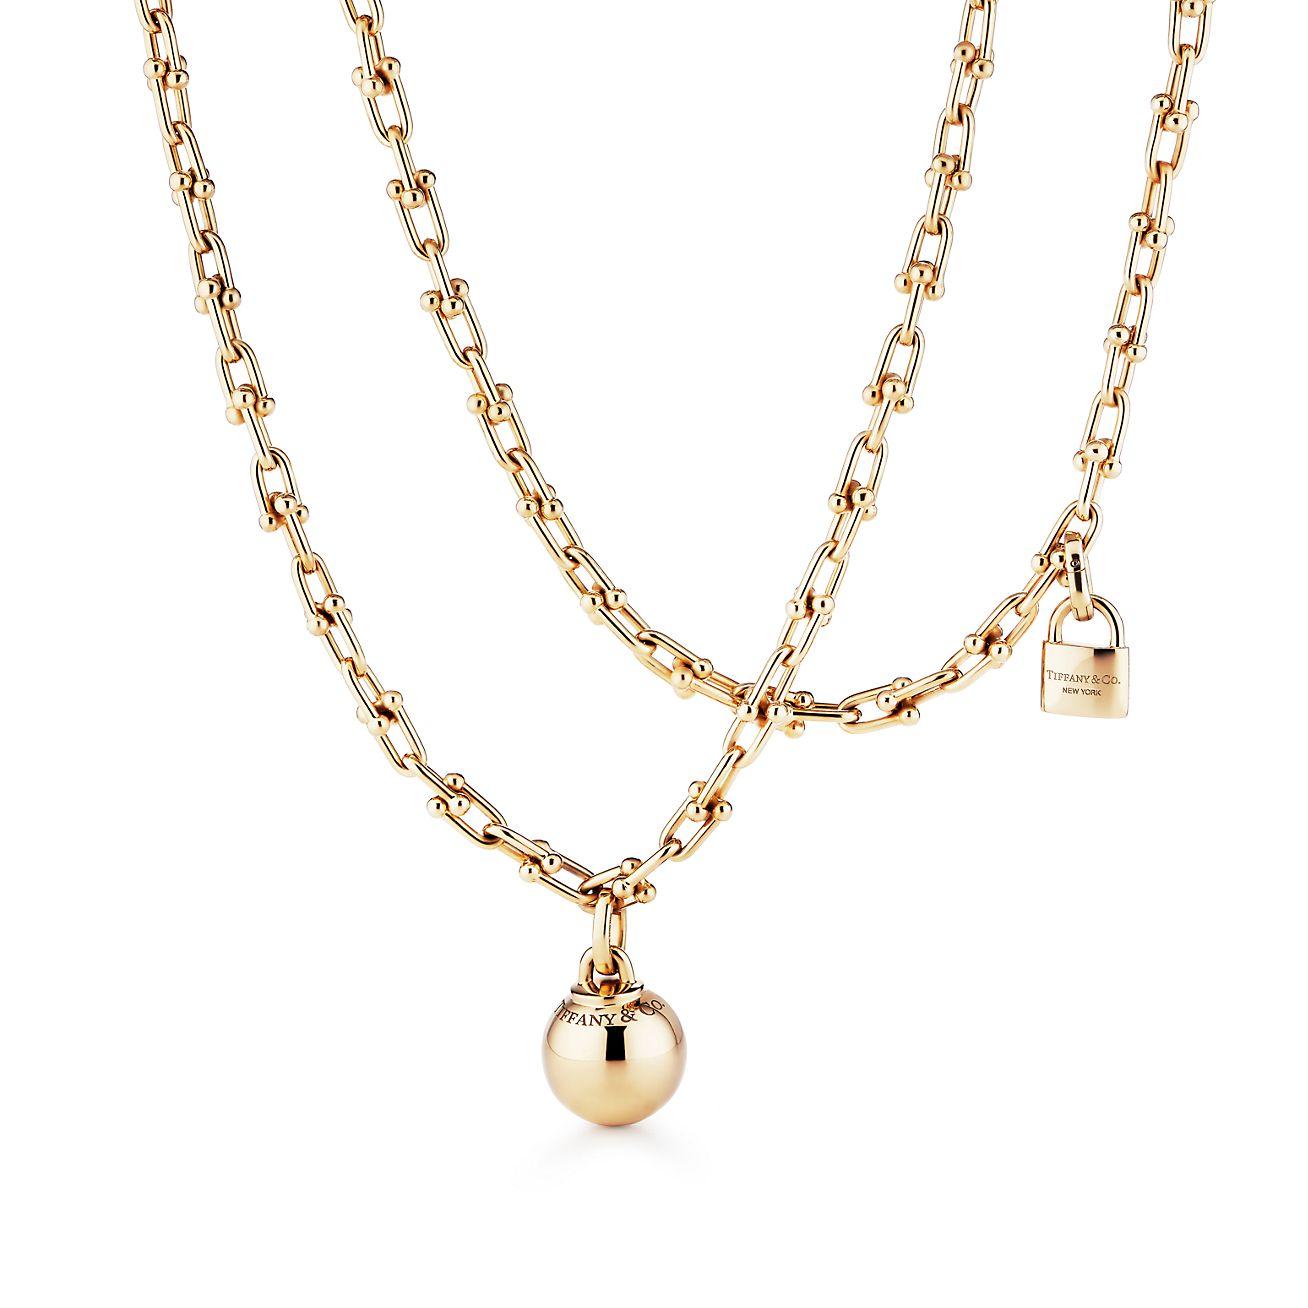 tiffany-hardwearwrap-necklace-60700923_993625_ED